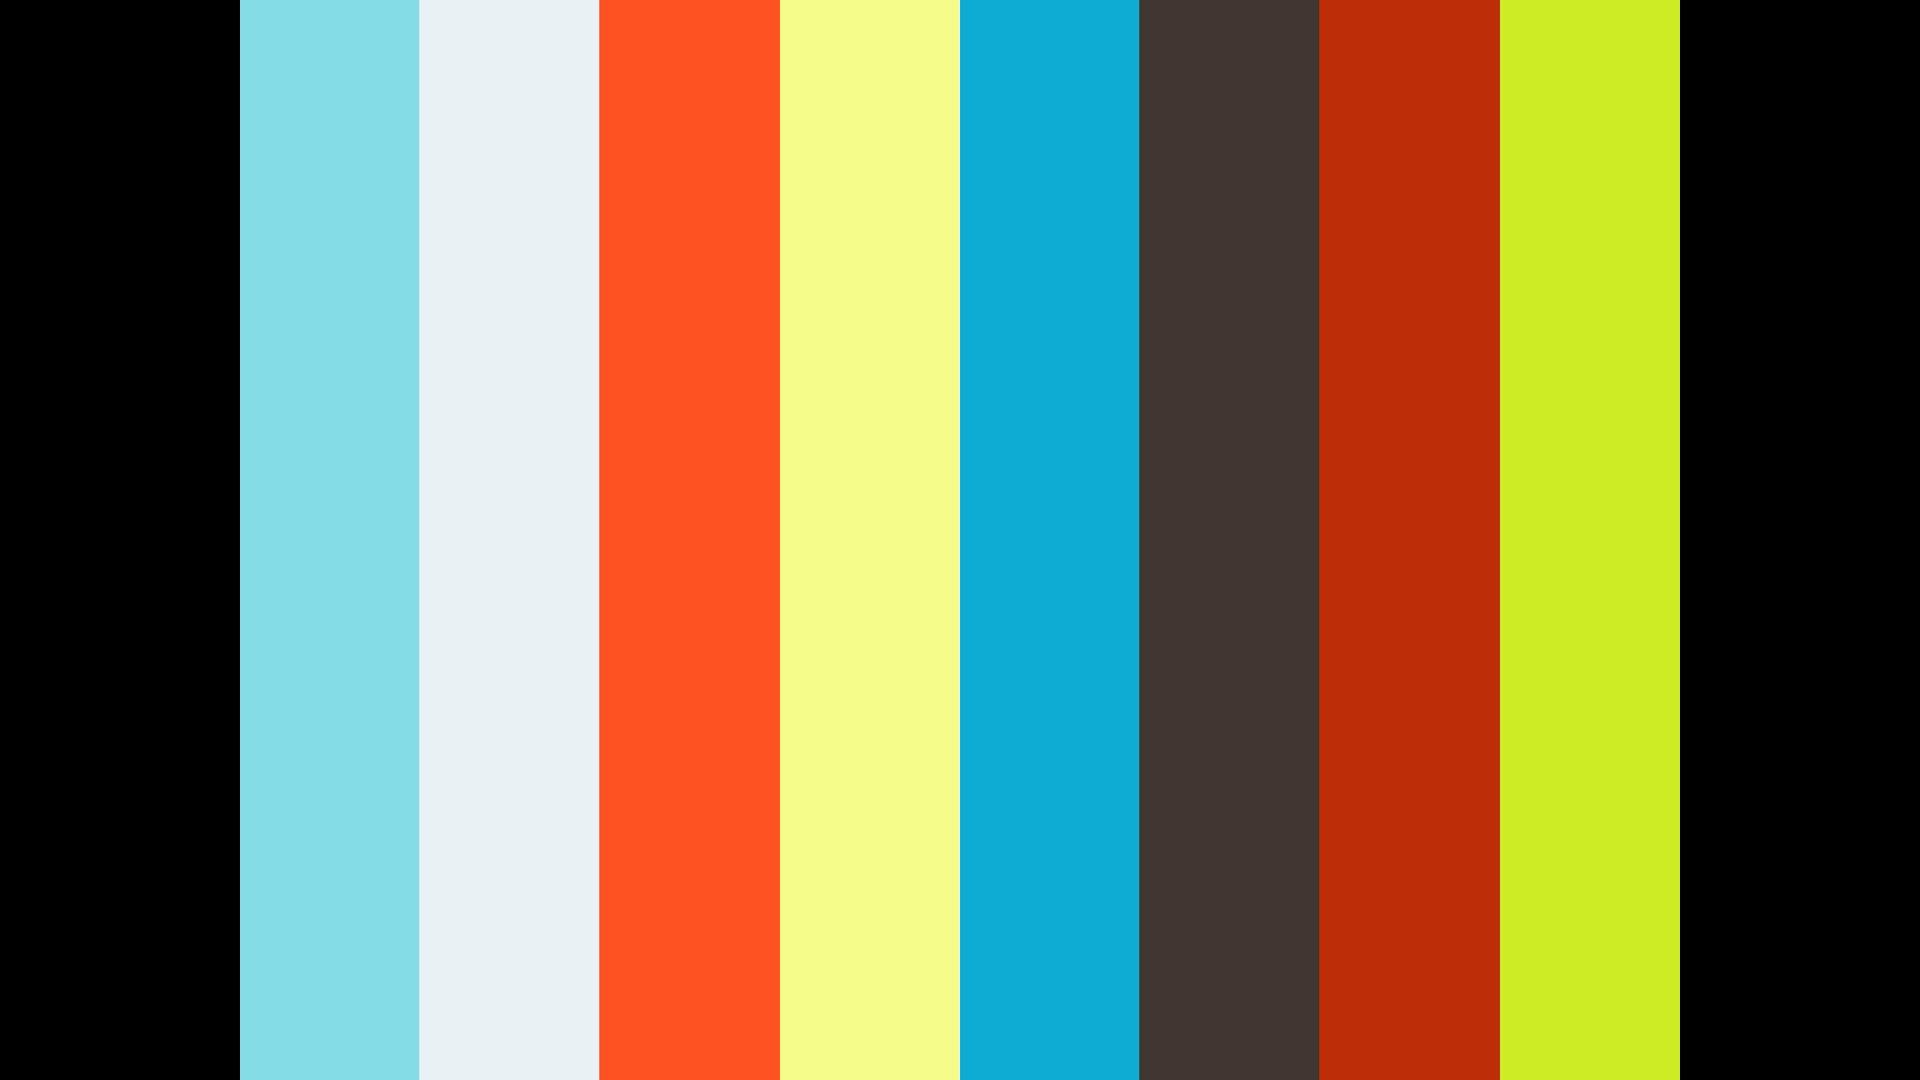 Minox ZP5 5-25, Minox ZP5 5-25×56 THLR – First Thoughts